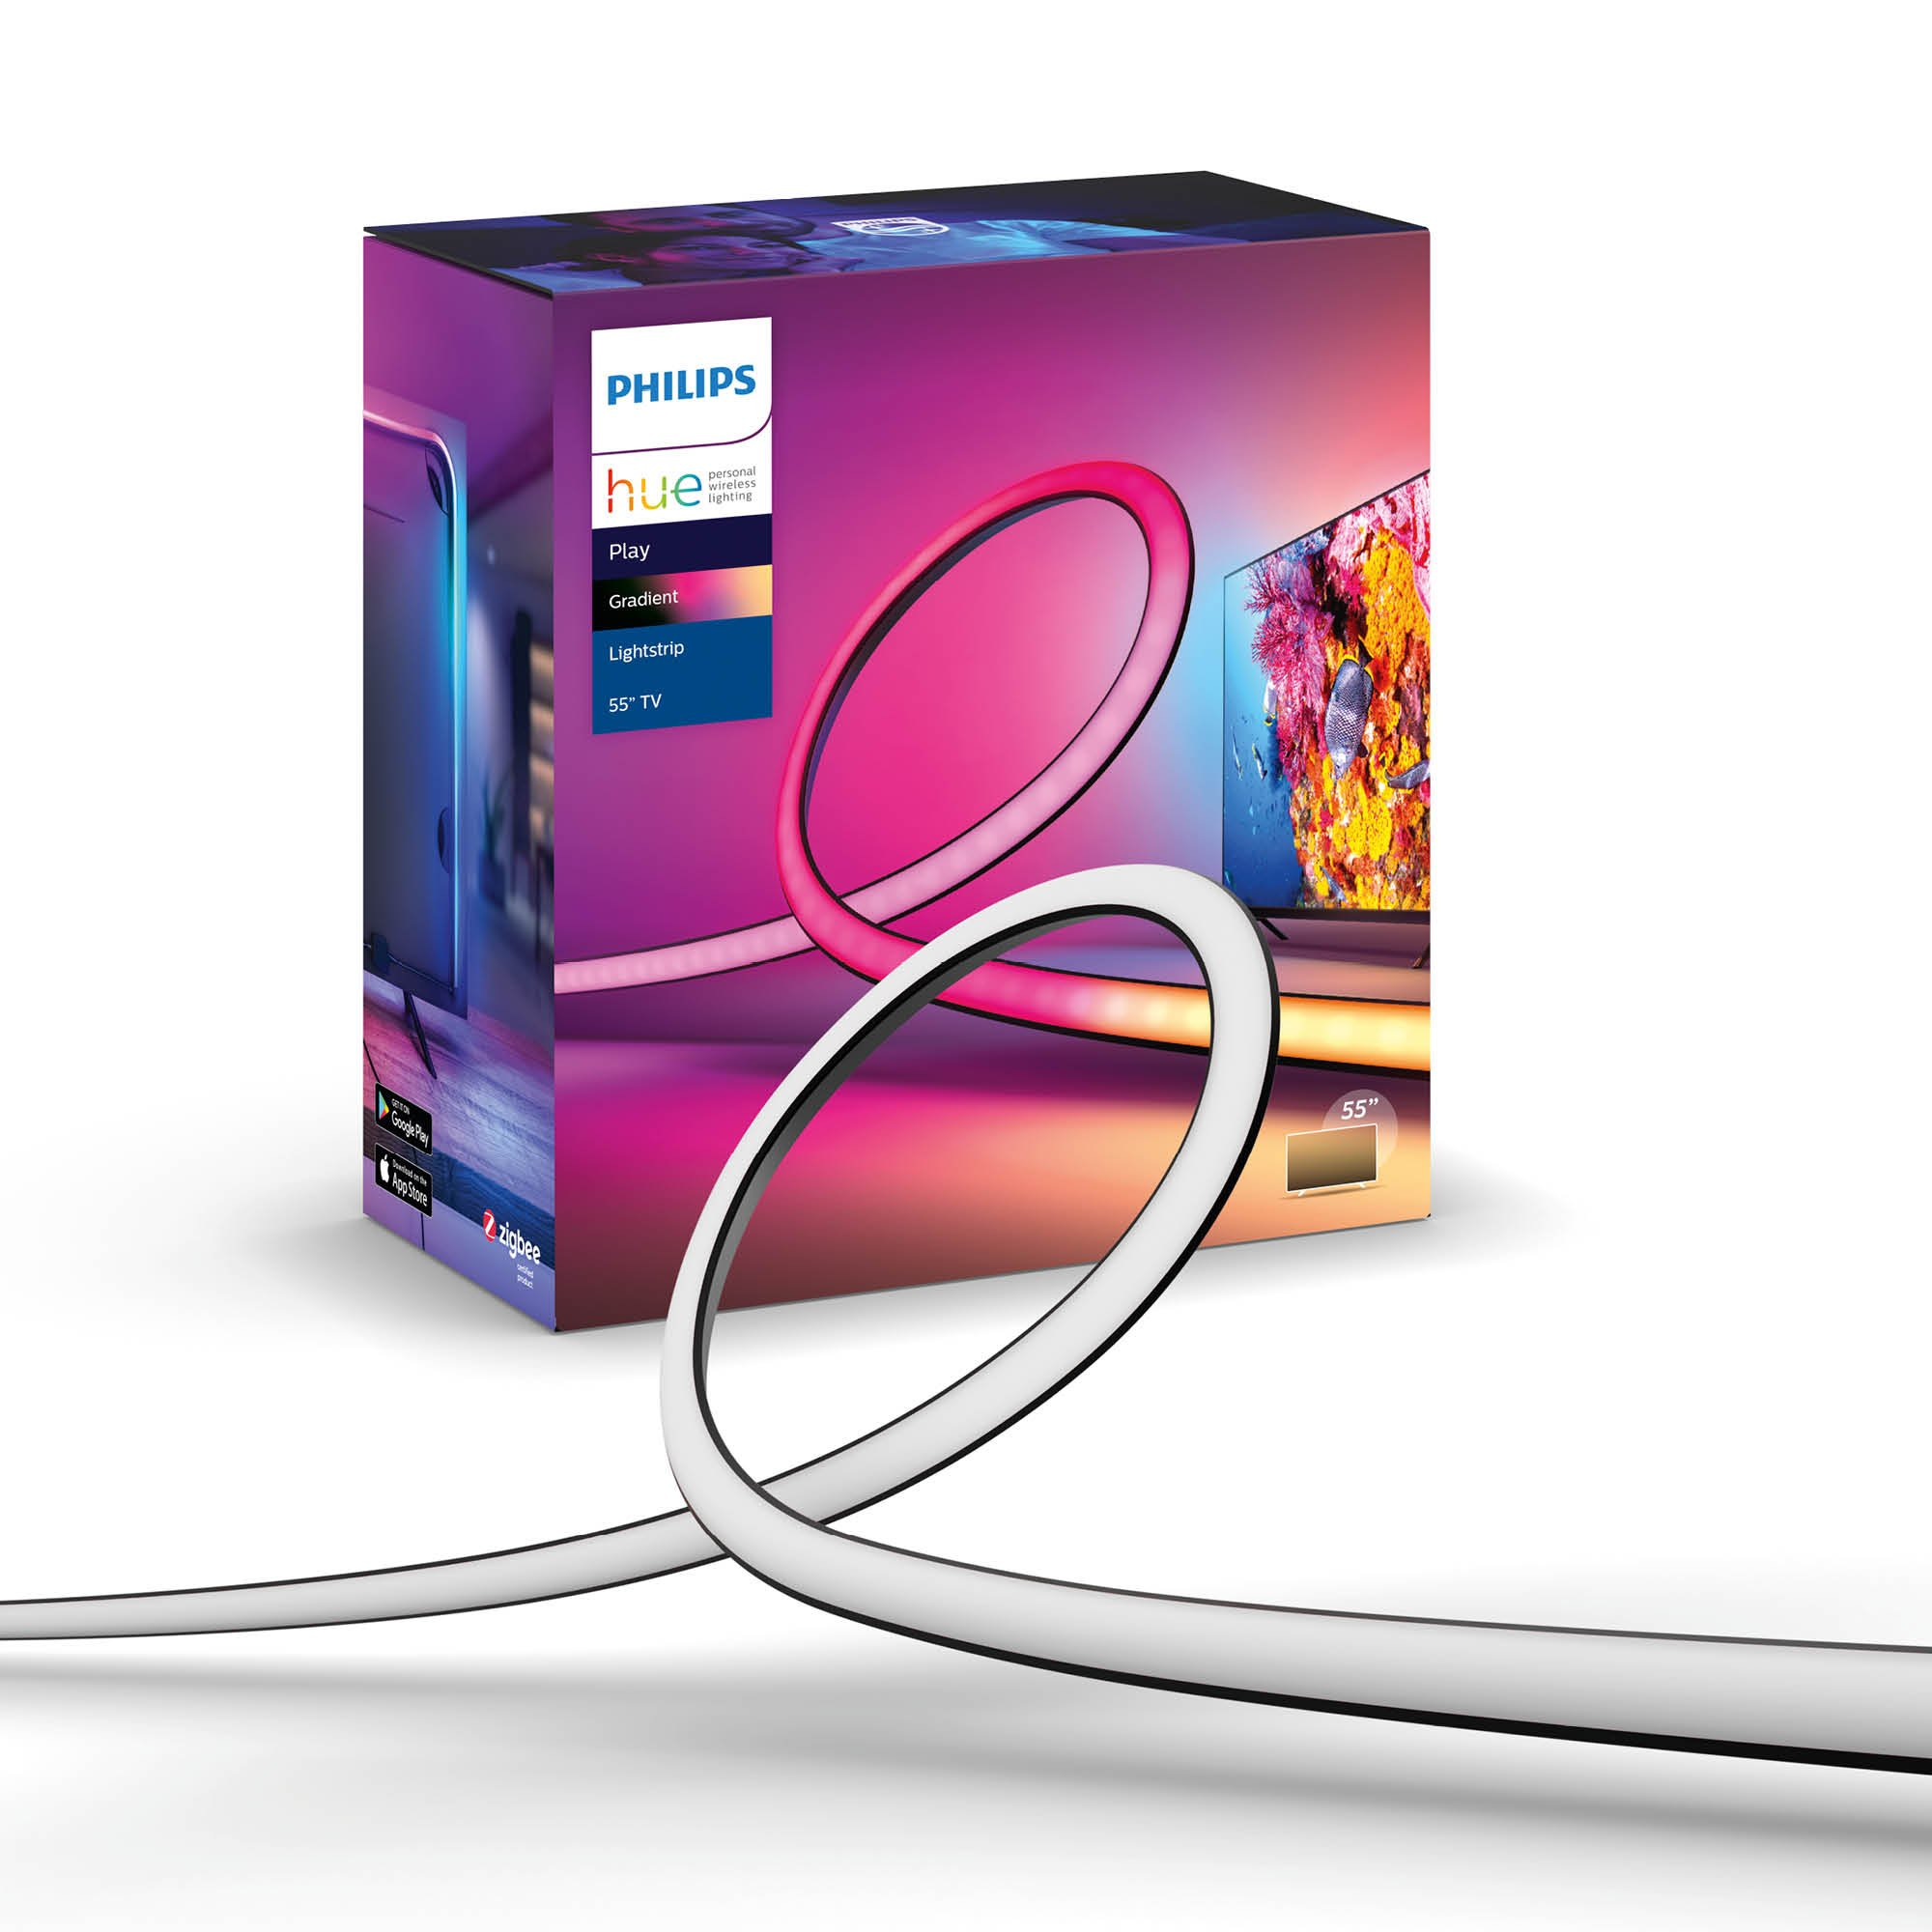 "Philips Hue - Lightstrip Gradient Lightstrip (for TV) TV 55"" EU Requires Hue Sync Box"